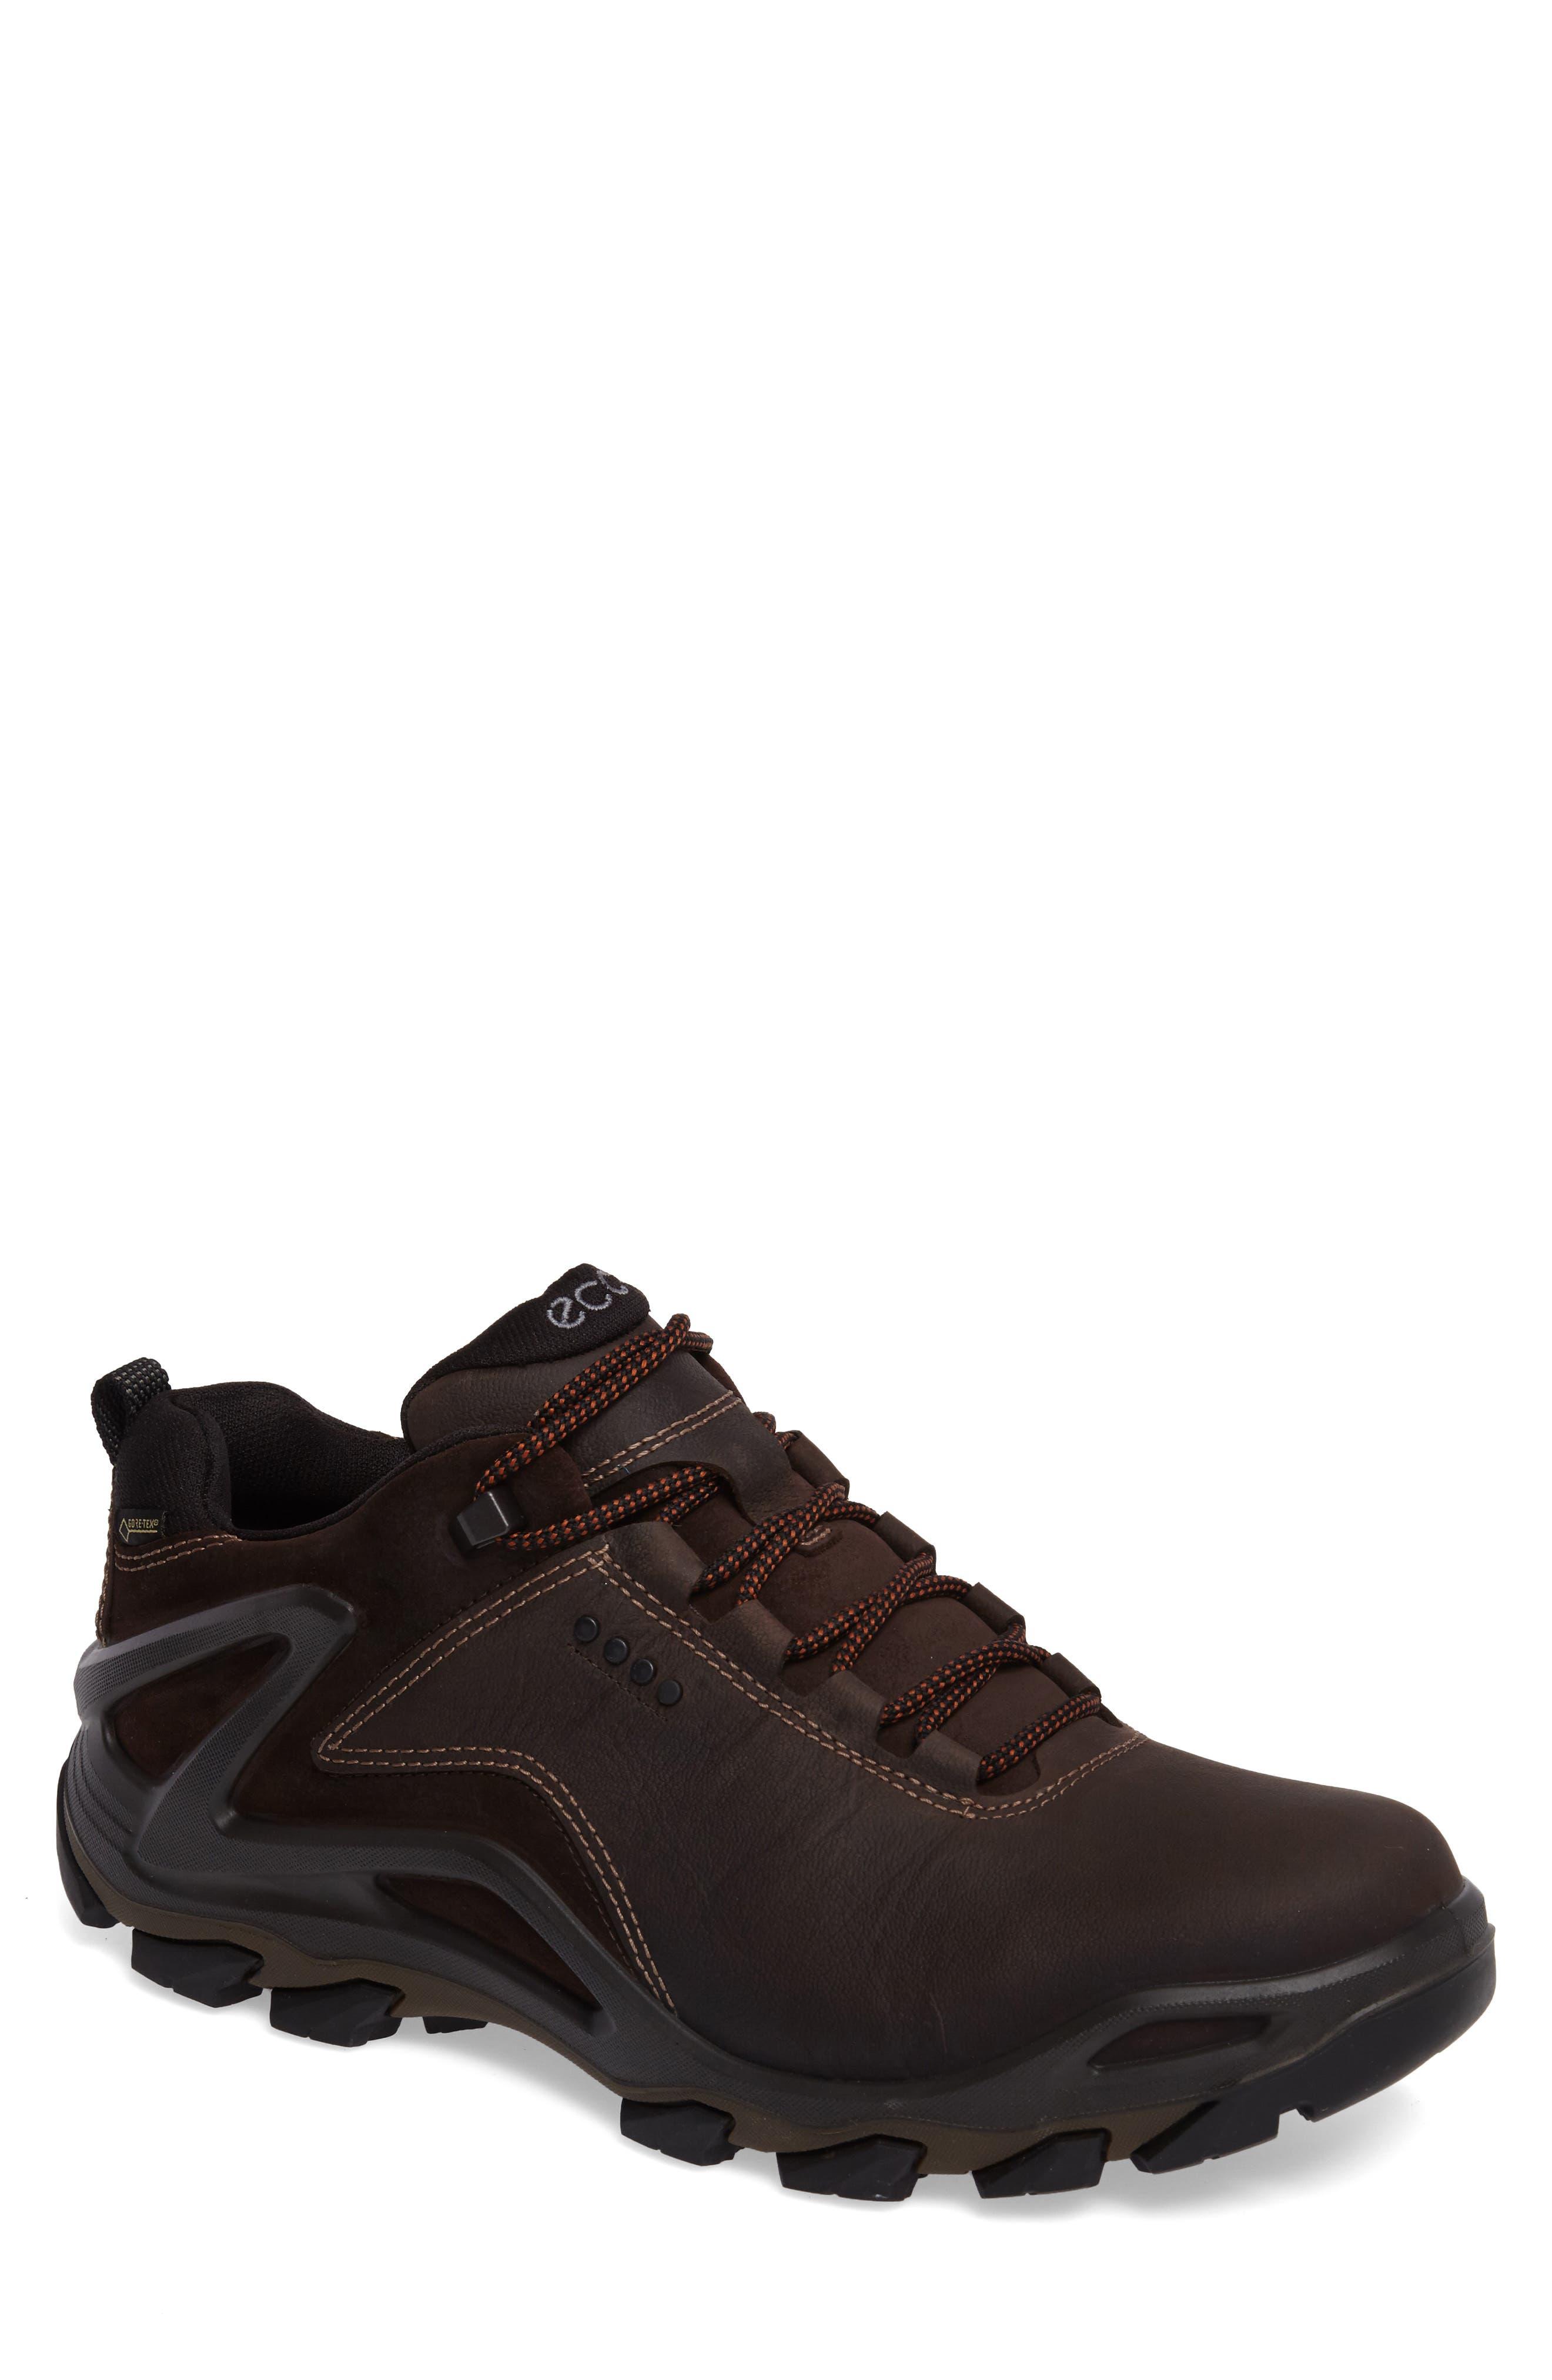 Terra Evo GTX Low Hiking Shoe,                         Main,                         color, BLACK NUBUCK/ SUEDE